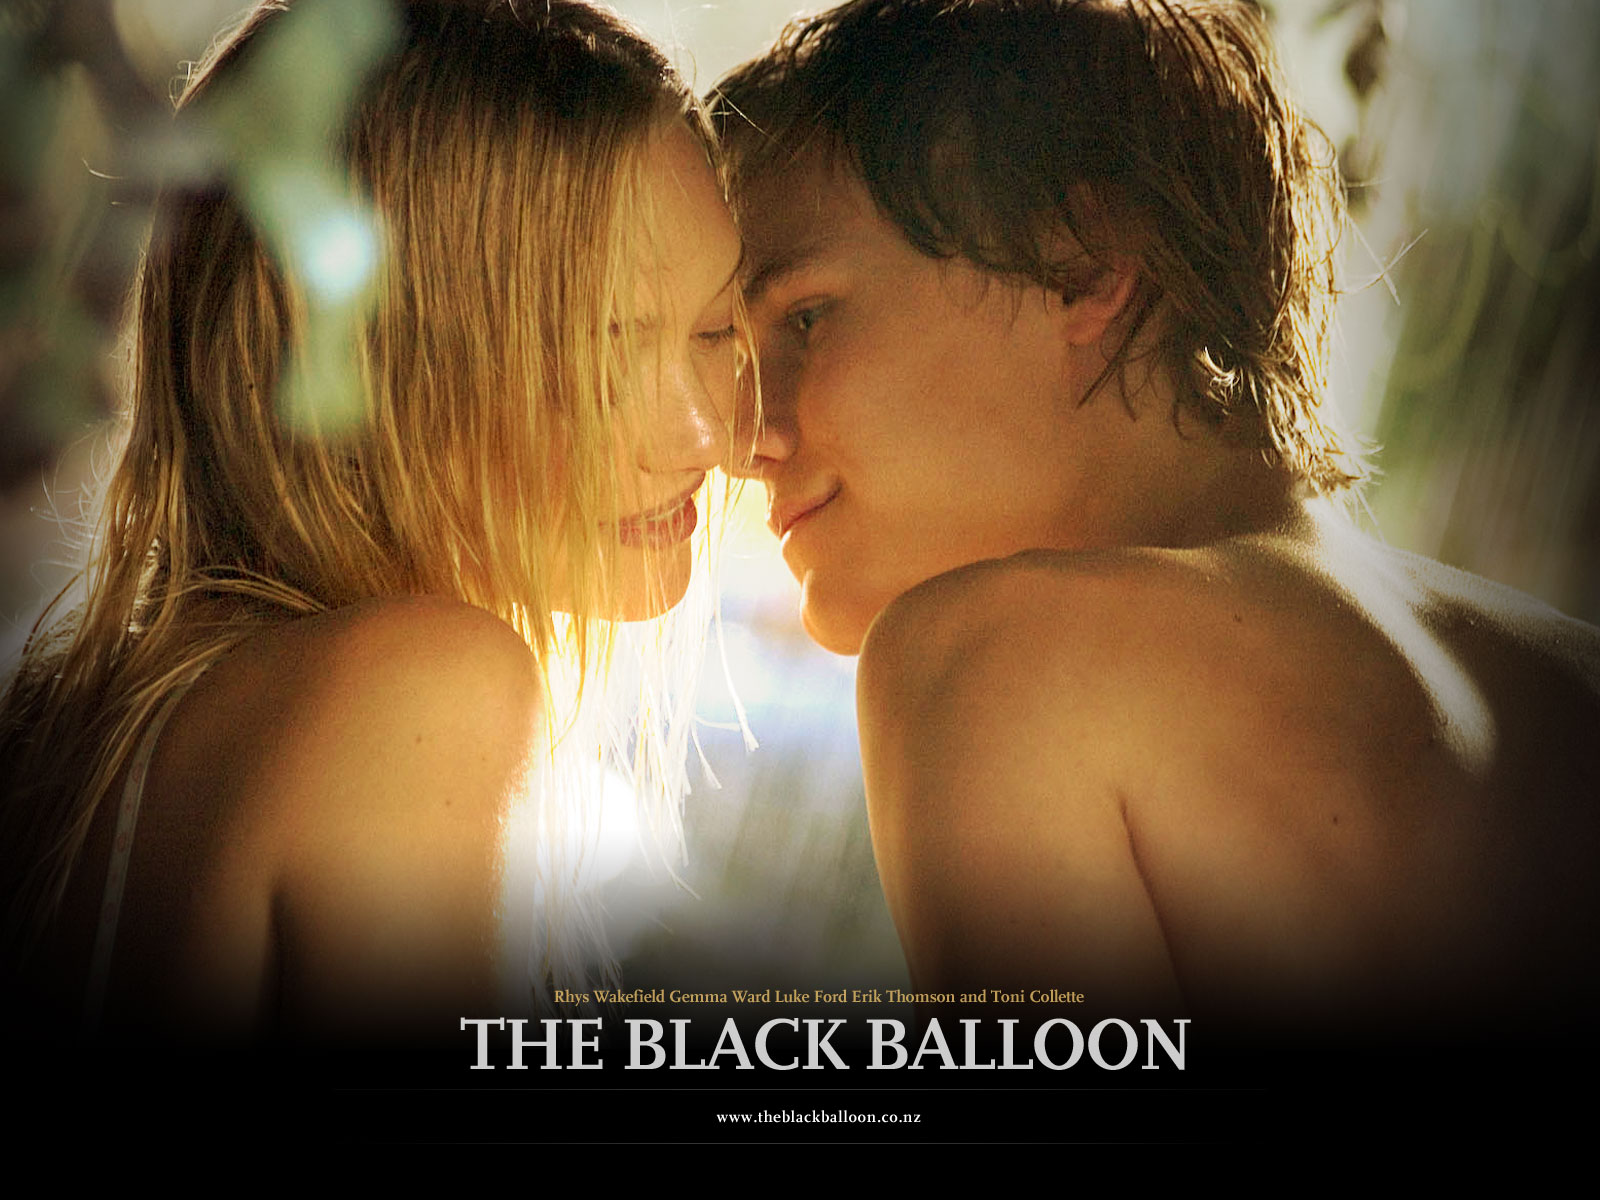 http://1.bp.blogspot.com/_aAcplodV6IQ/TLlM-_PgU8I/AAAAAAAABKw/M0zJ1vh4WQc/s1600/Gemma_Ward_in_The_Black_Balloon_Wallpaper_1_1280.jpg